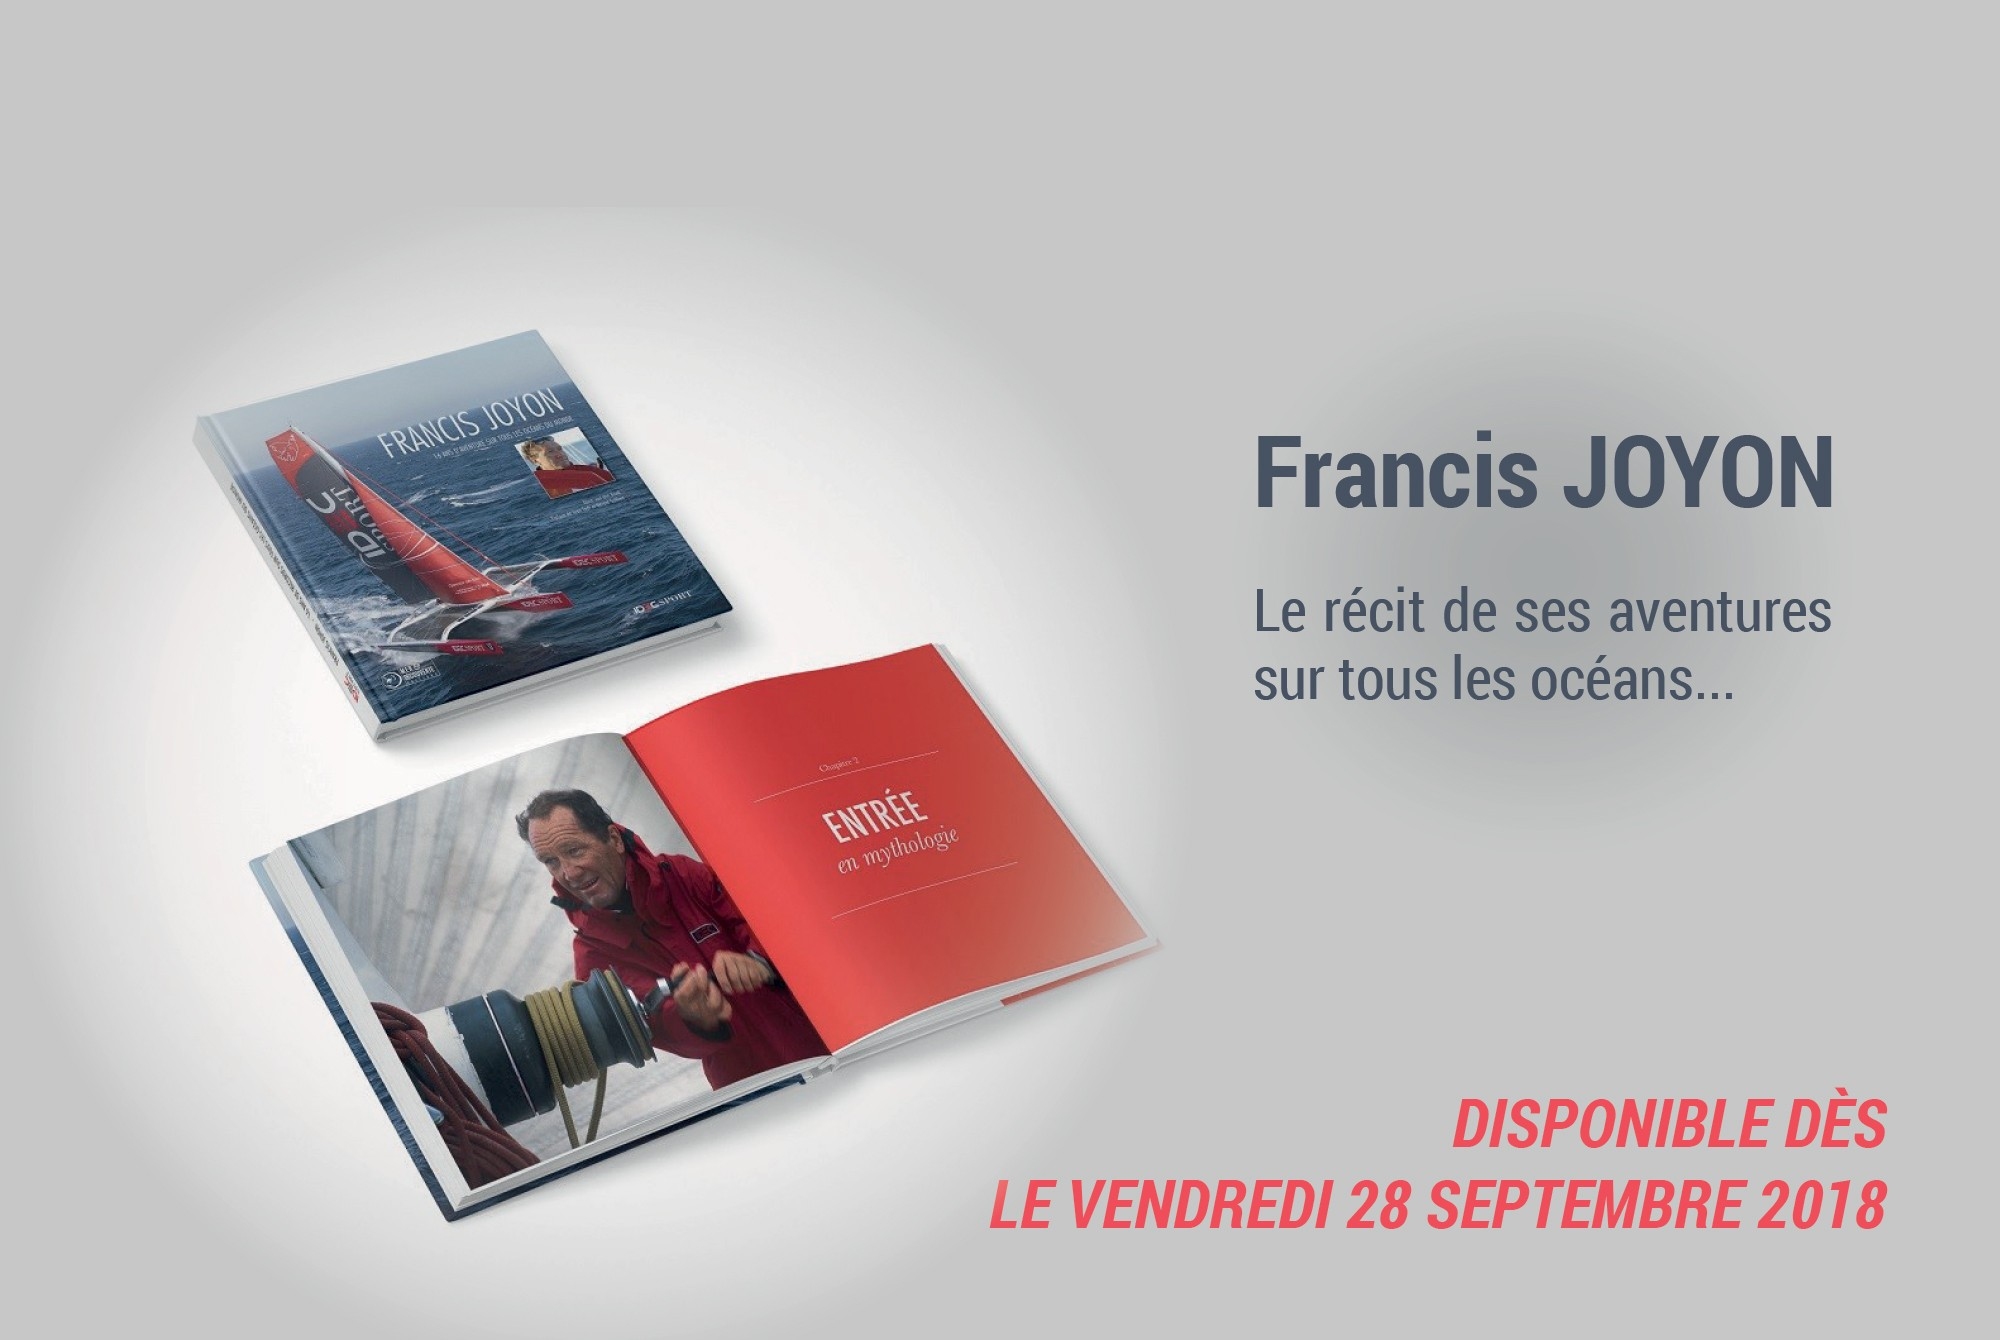 Livre de Francis Joyon 2018